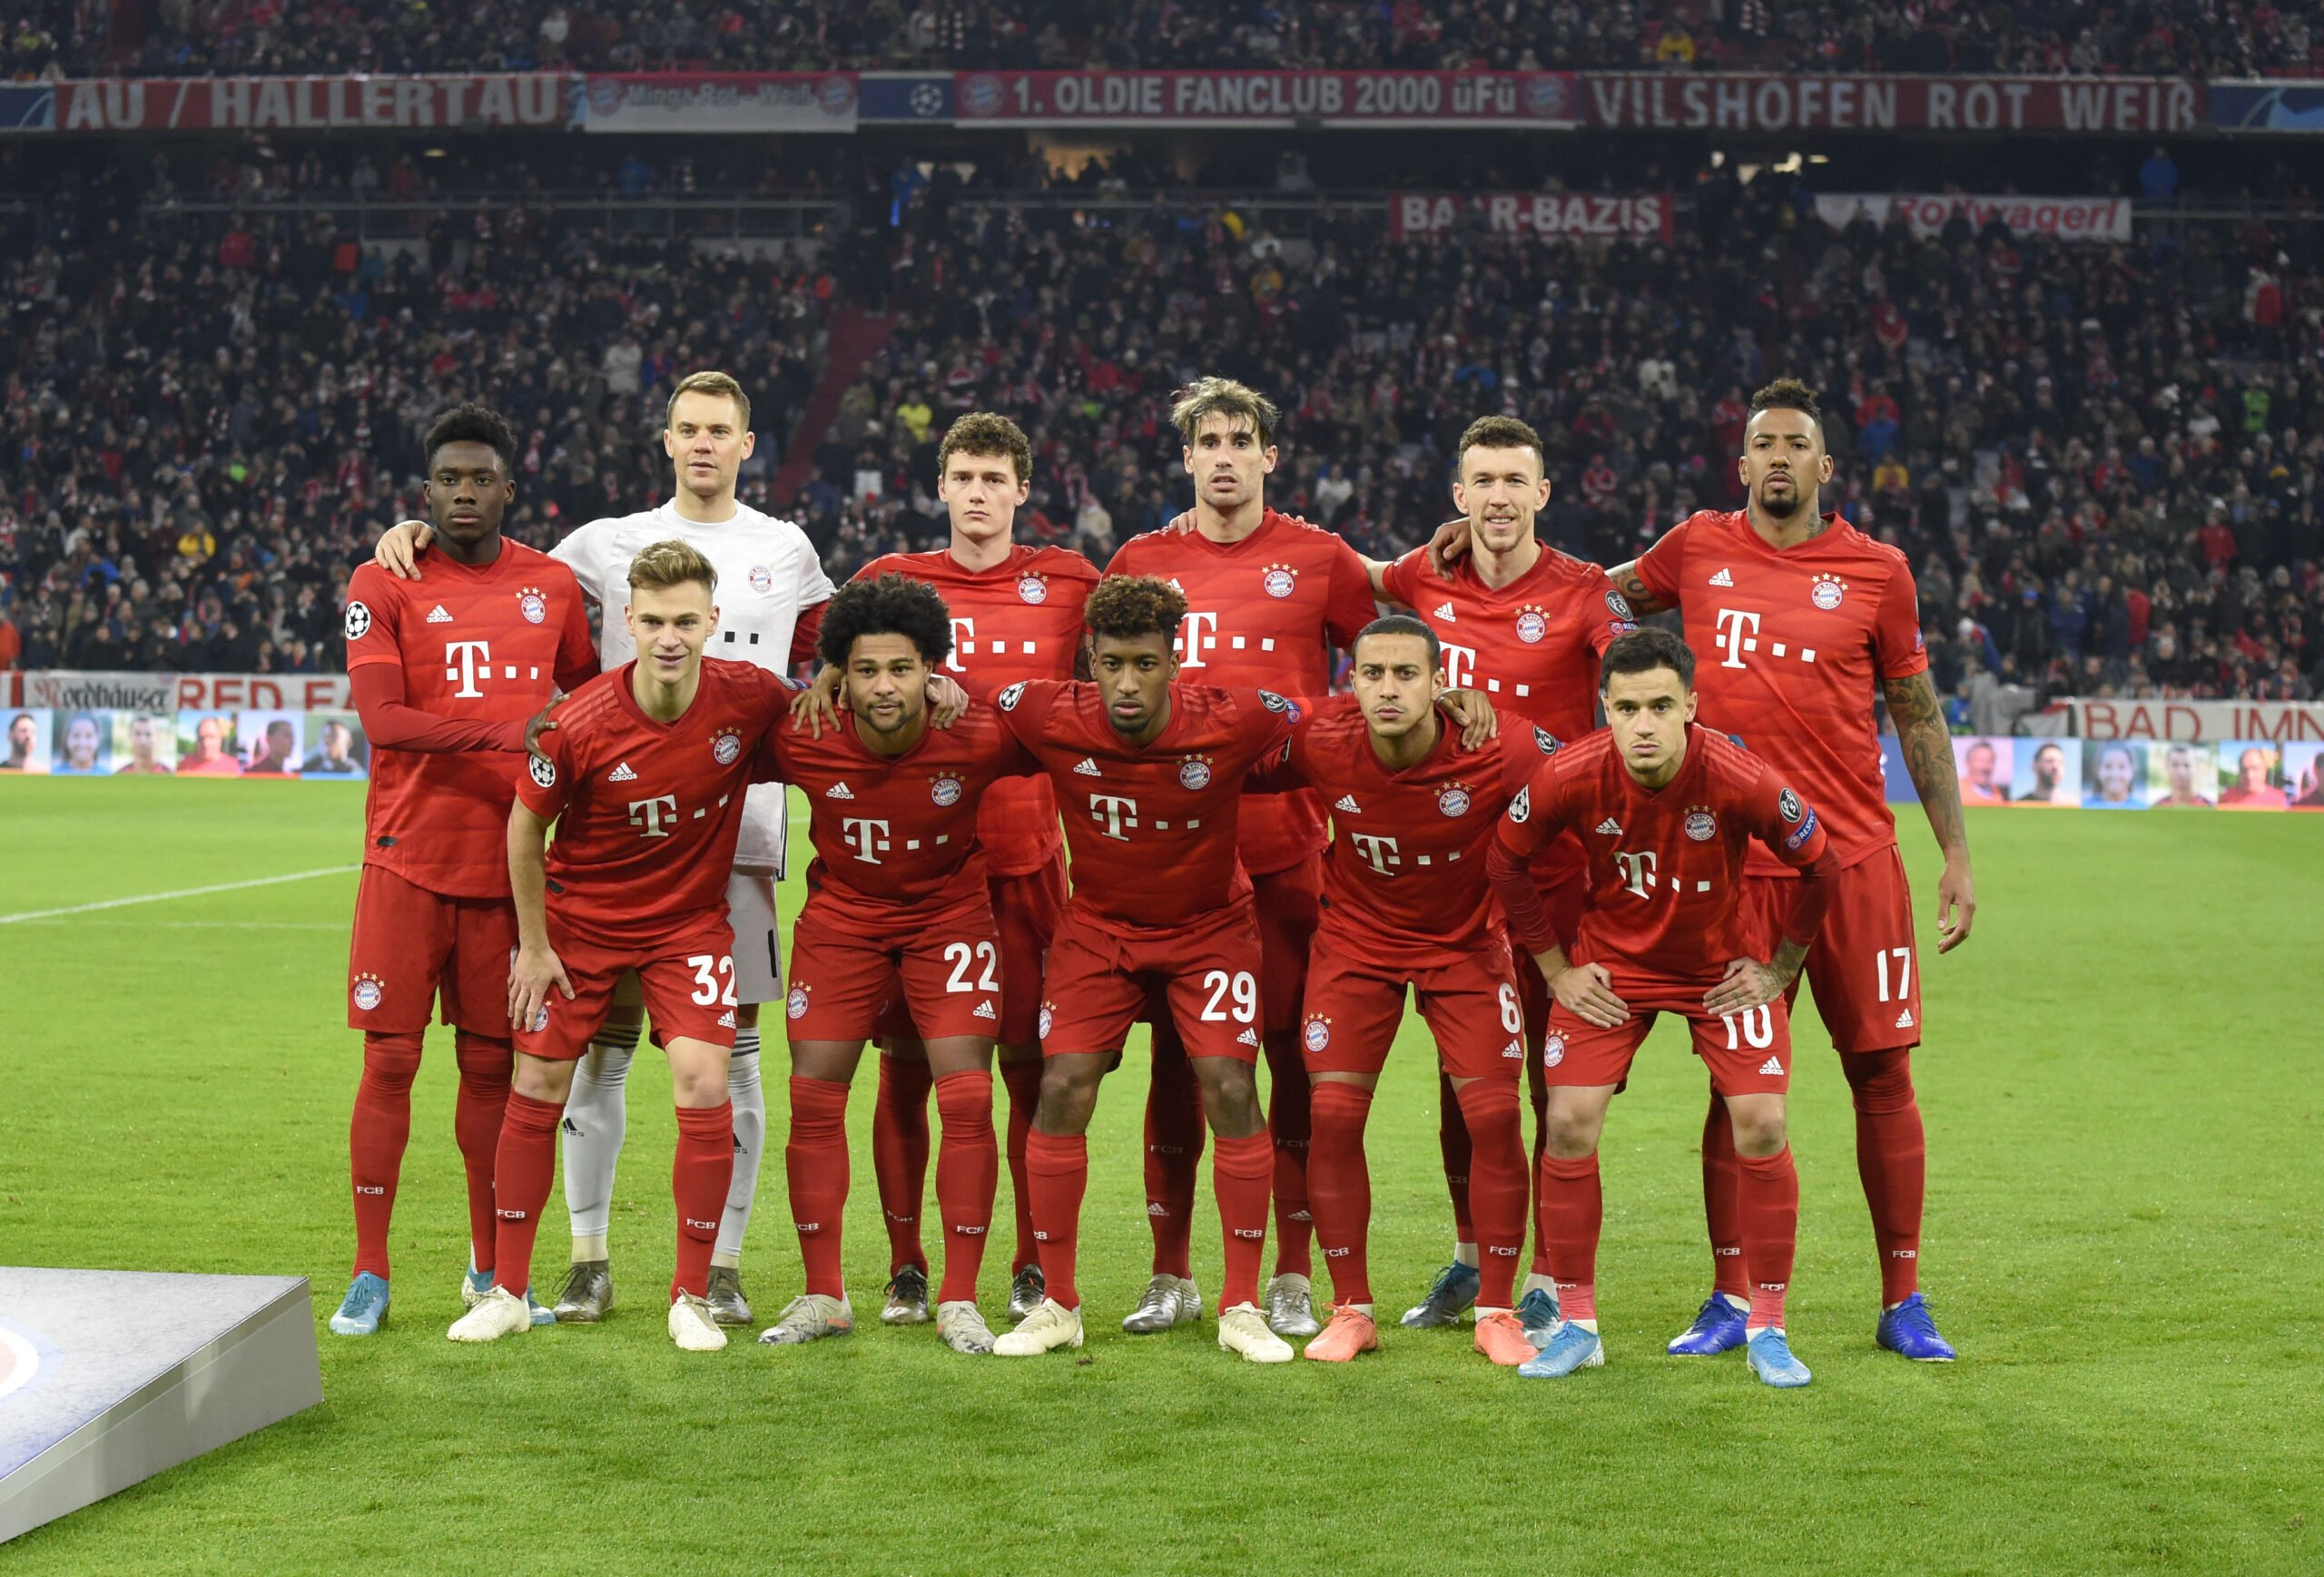 FC Bayern Team